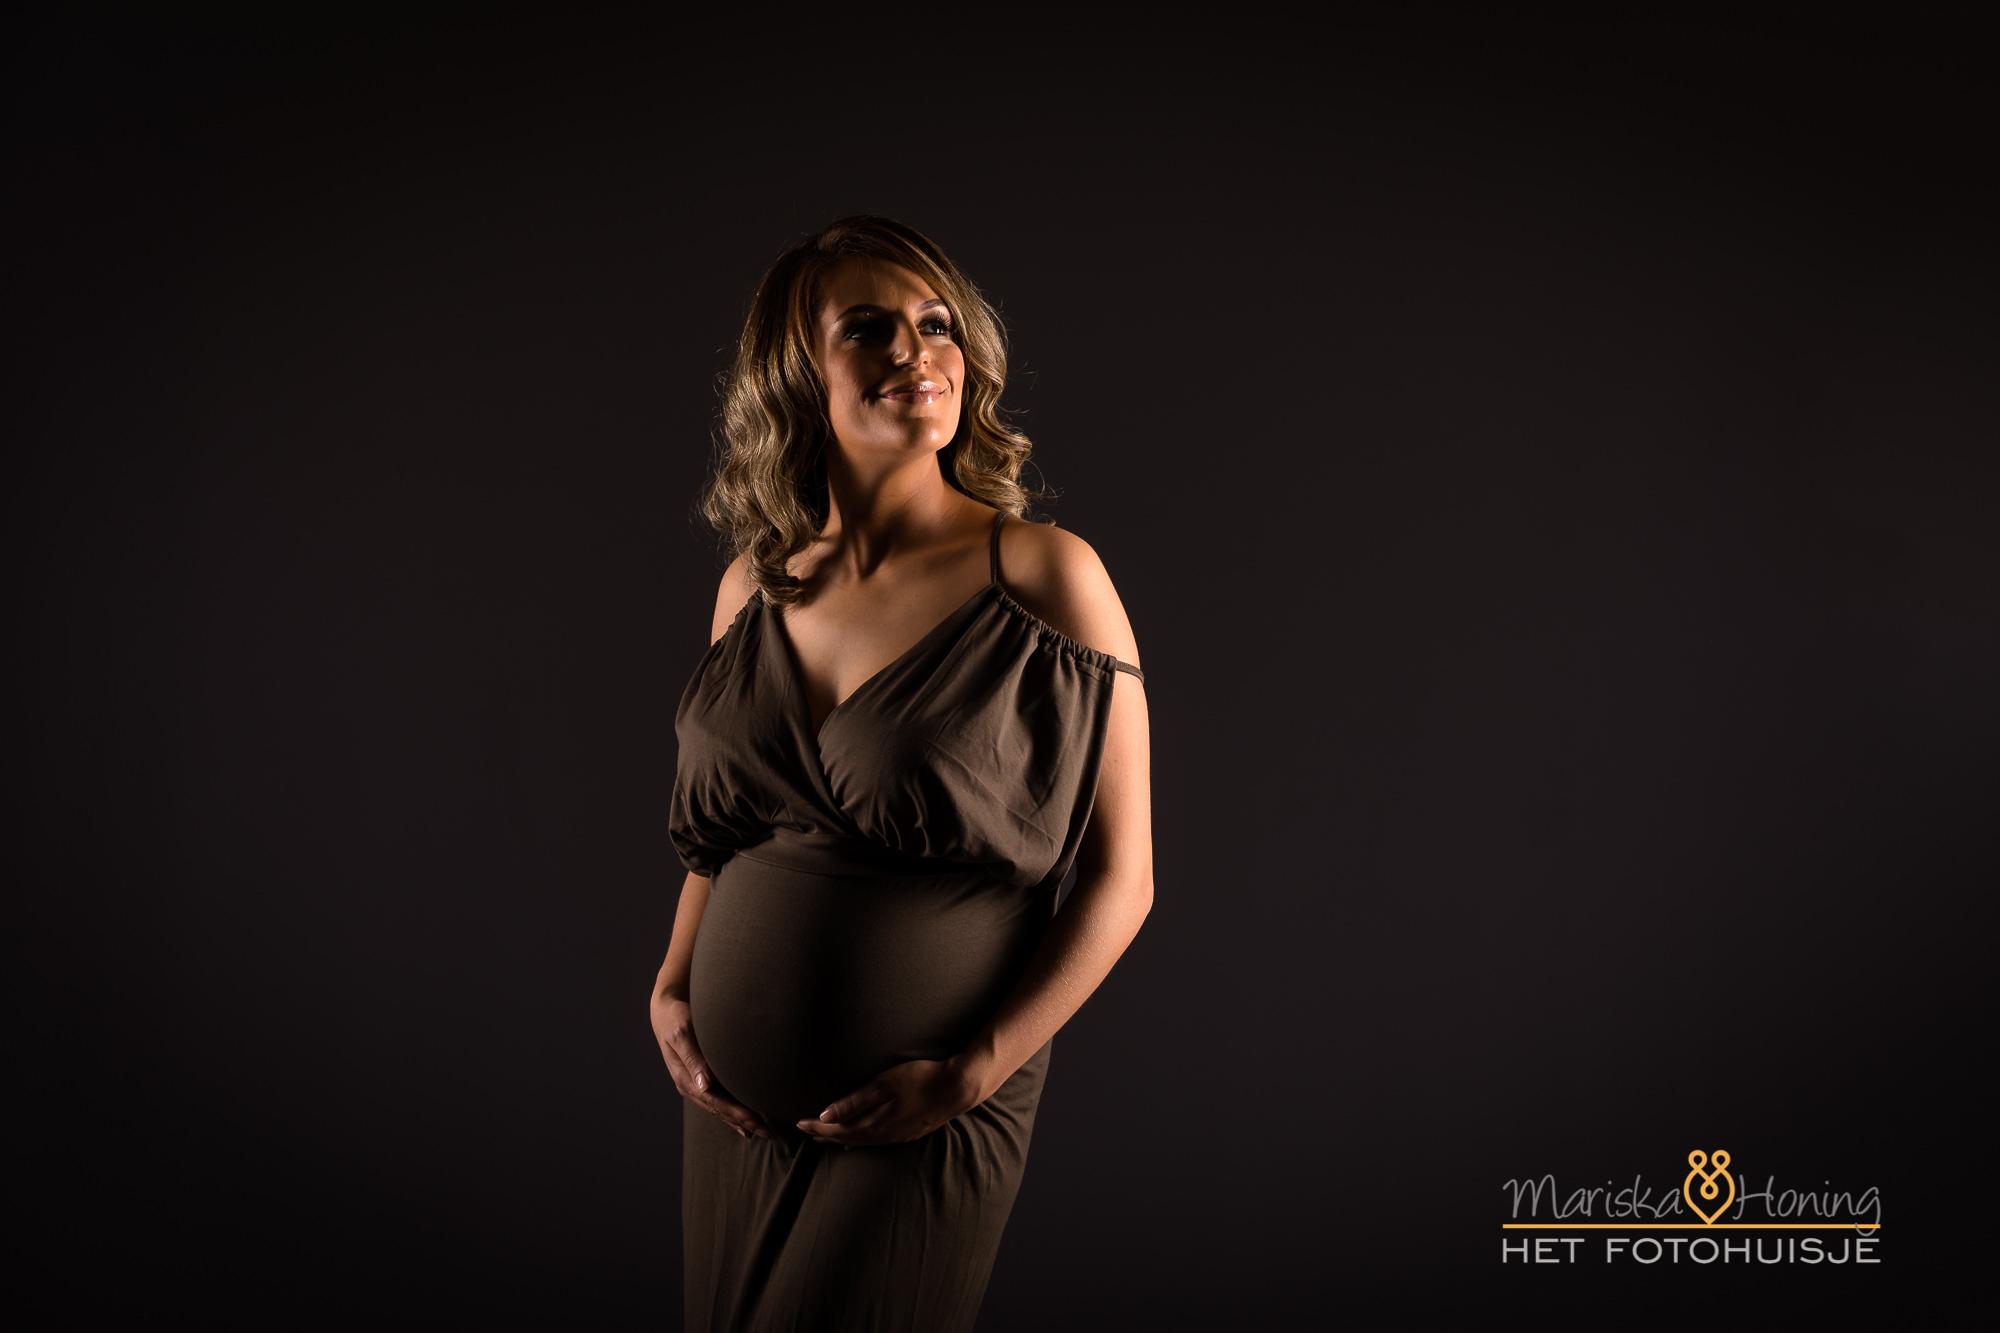 Zwanger zwangerschap pregnancy lelystad flevoland